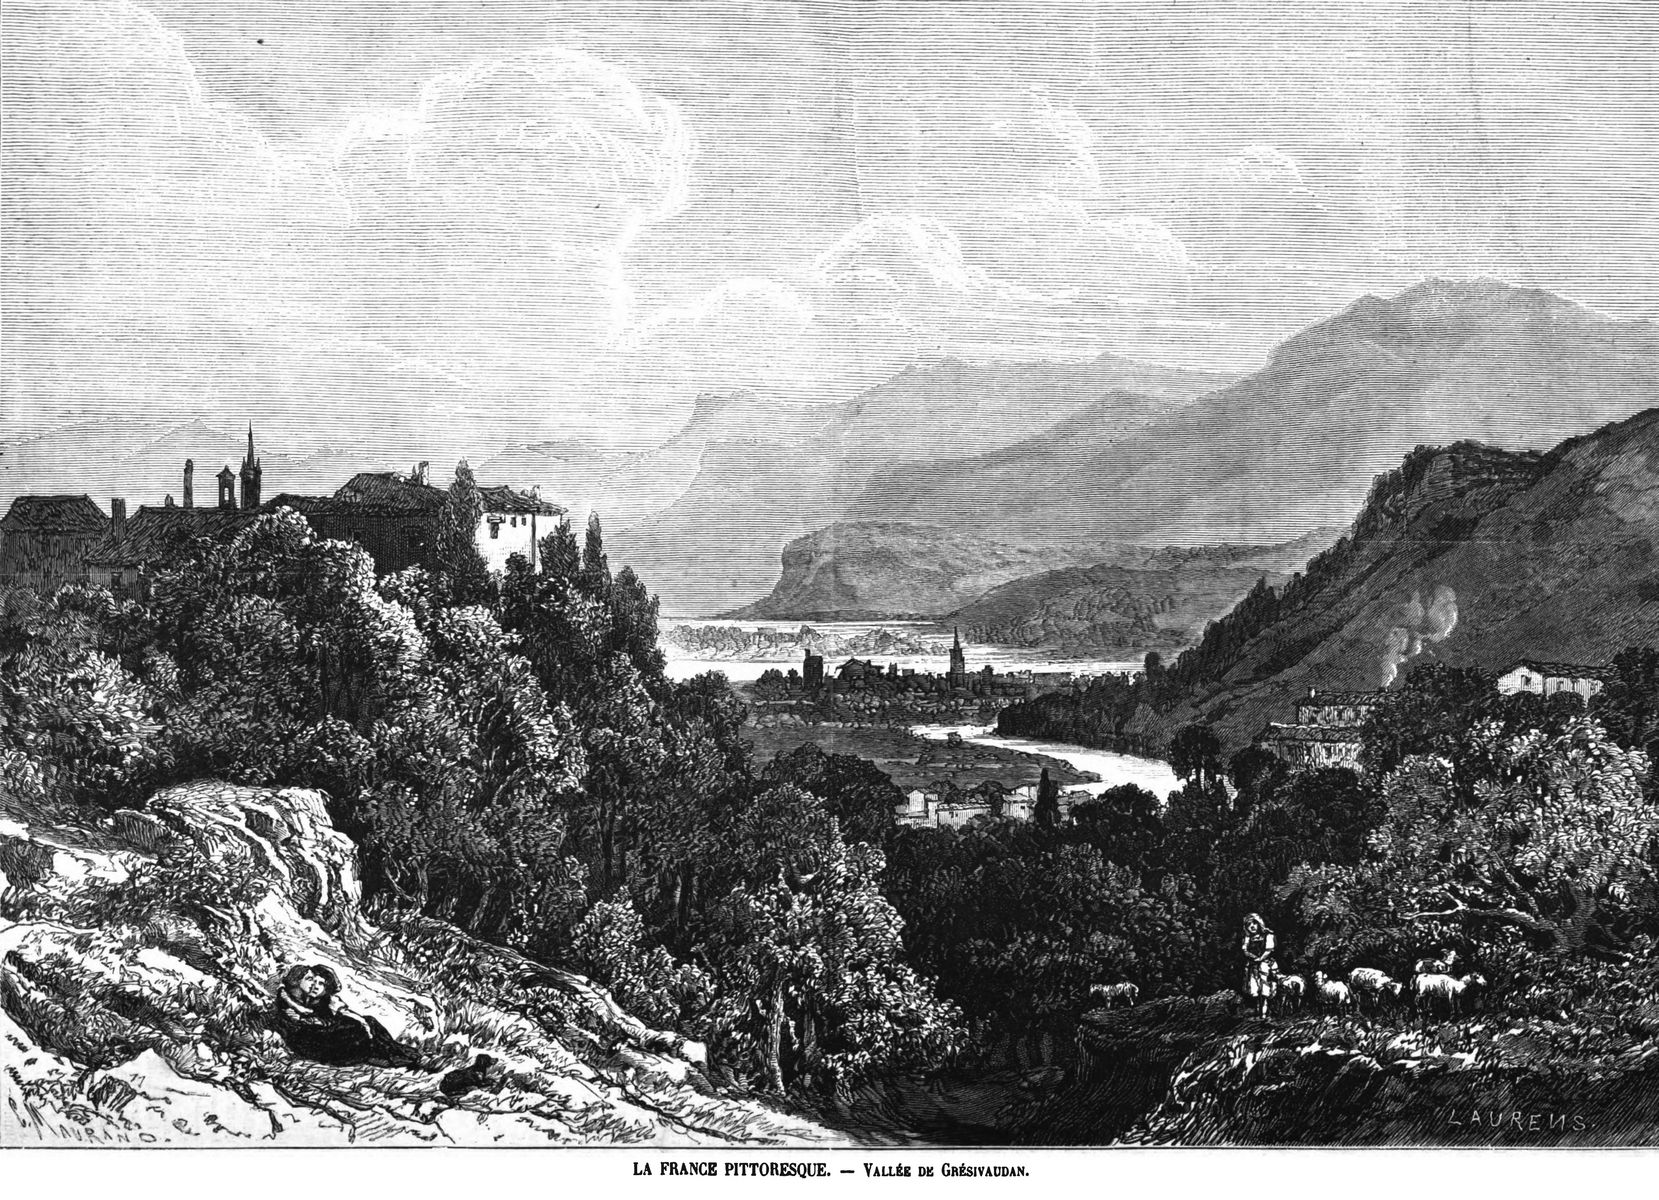 La France pittoresque : vallée de Grésivaudan.